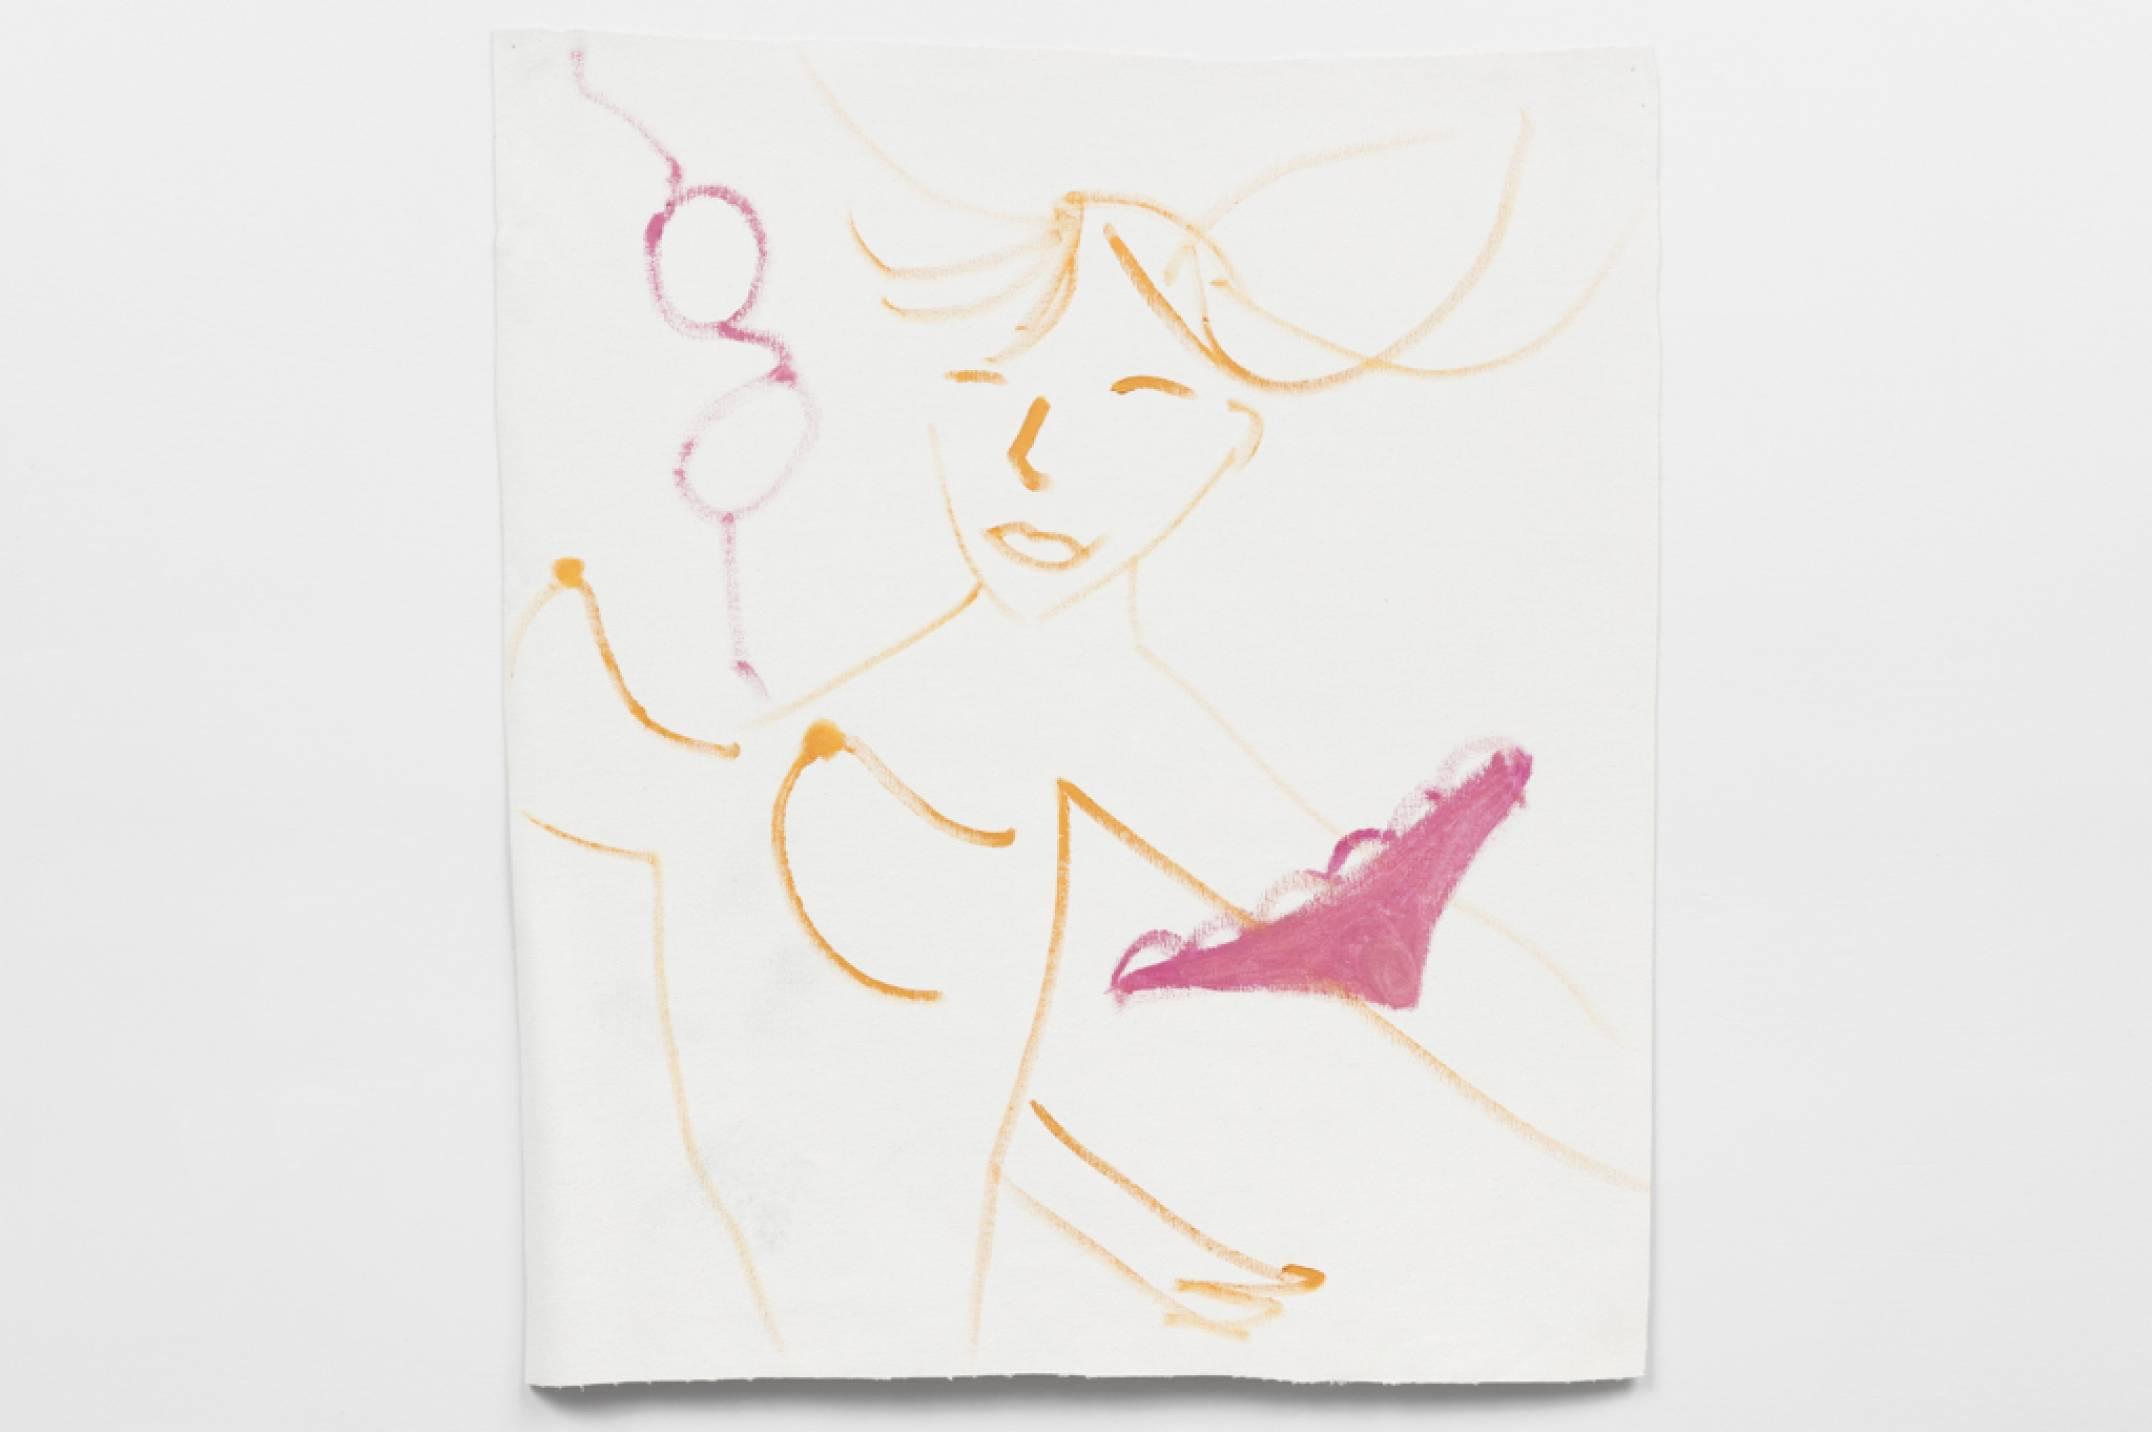 Trevor Shimizu, <em>untitled (zero gravity 4), not aged,</em>&nbsp;2017,&nbsp;oil on canvas, 91 × 81 cm - Mendes Wood DM